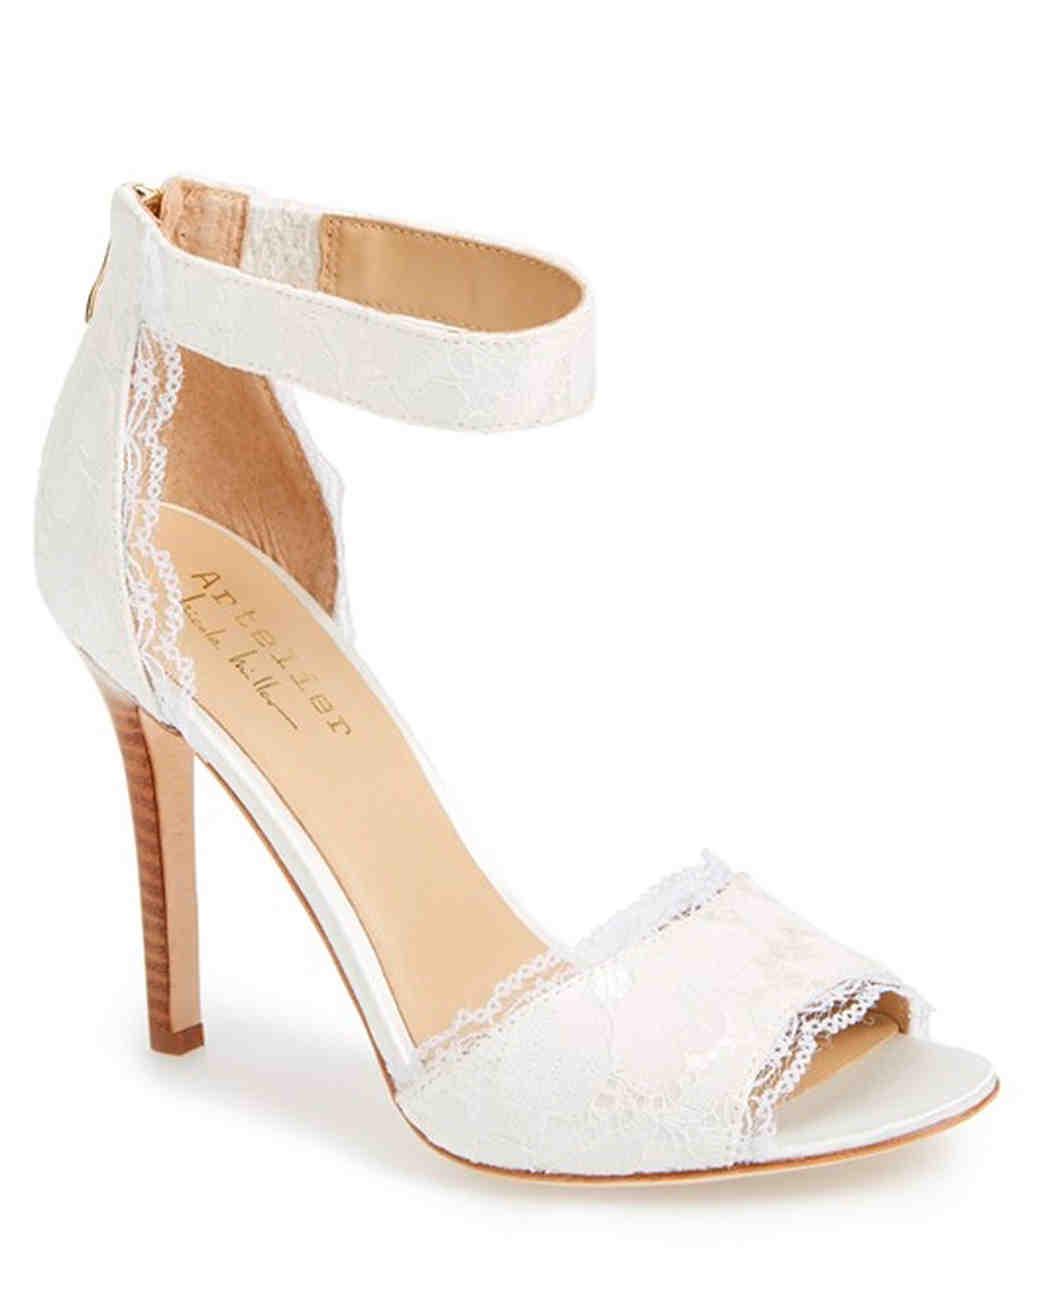 summer-wedding-shoes-nicole-miller-artelier-cocoa-lace-sandal-0515.jpg